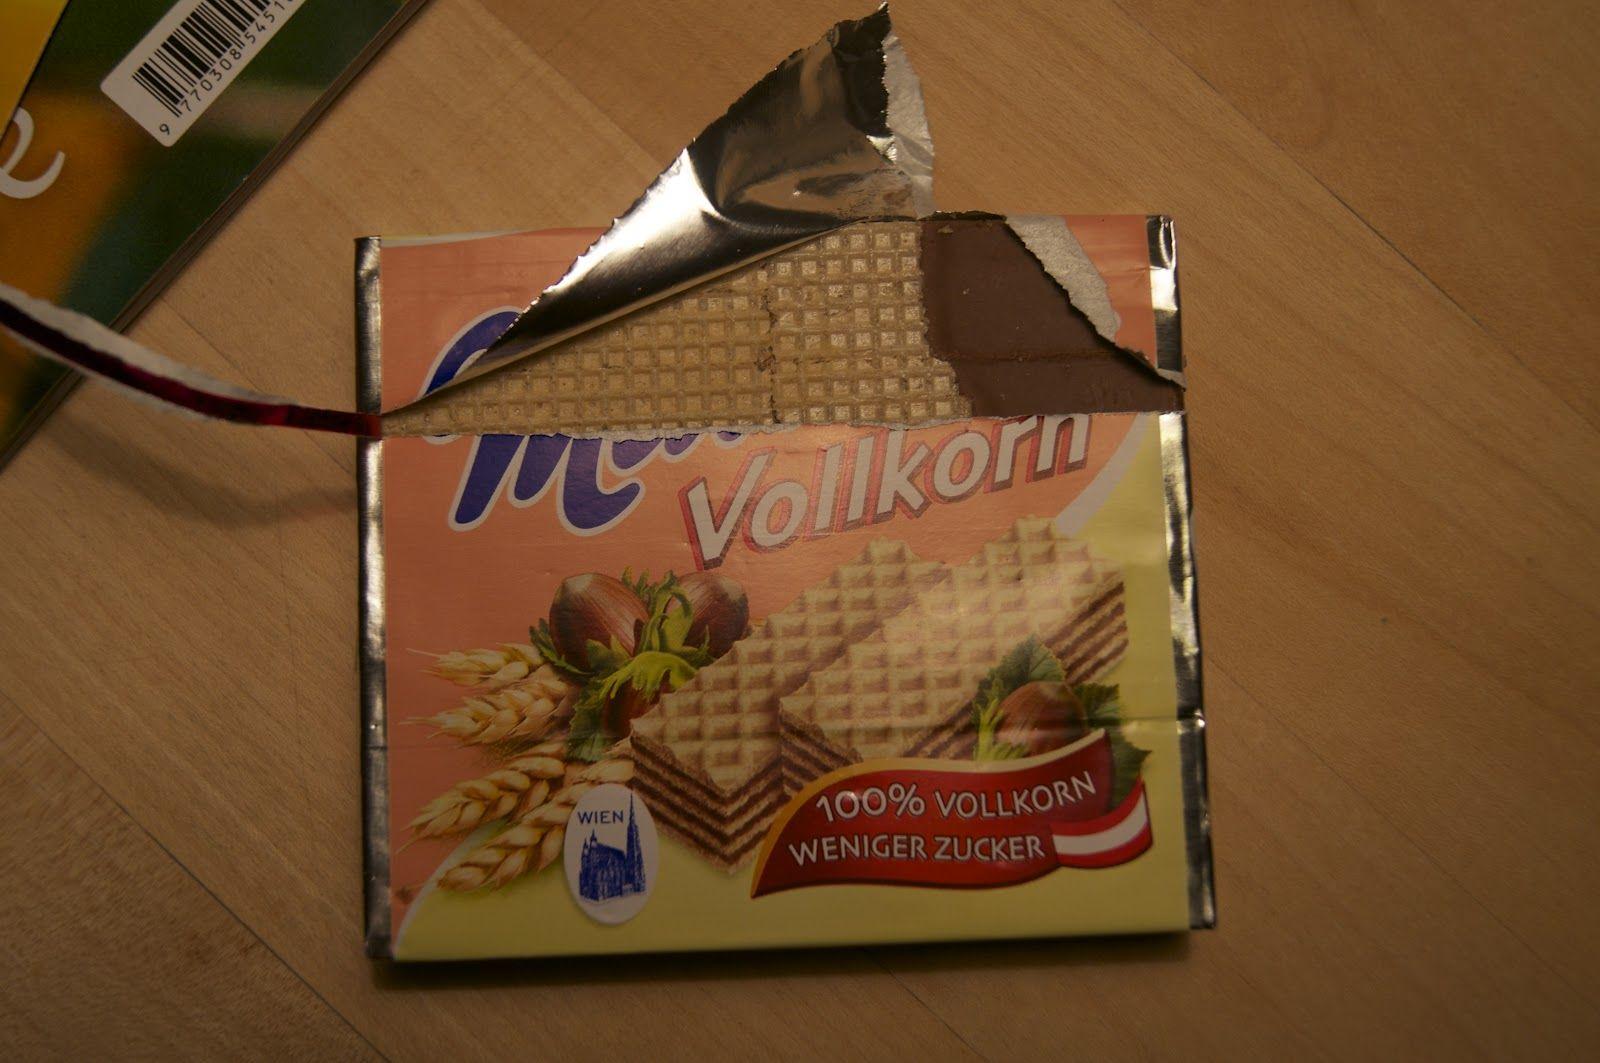 Vollkorn-Mannerschnitten. Sehr interessant!  http://voras-vegan-way.blogspot.co.at/2012/10/vegan-wednesday-8.html